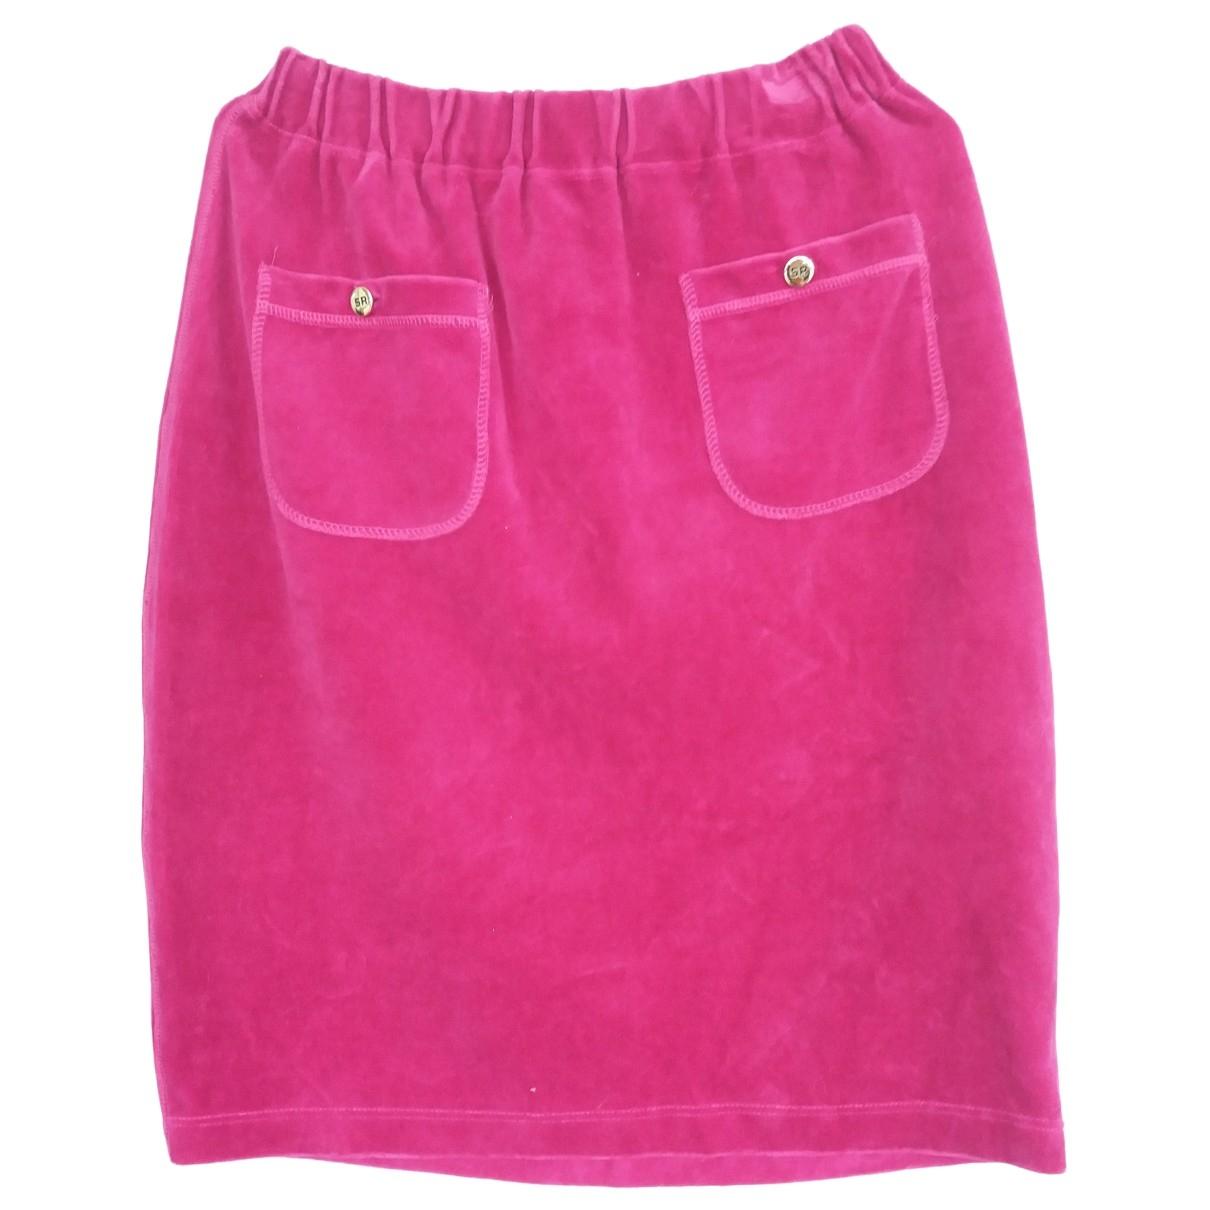 Mini falda Sonia Rykiel